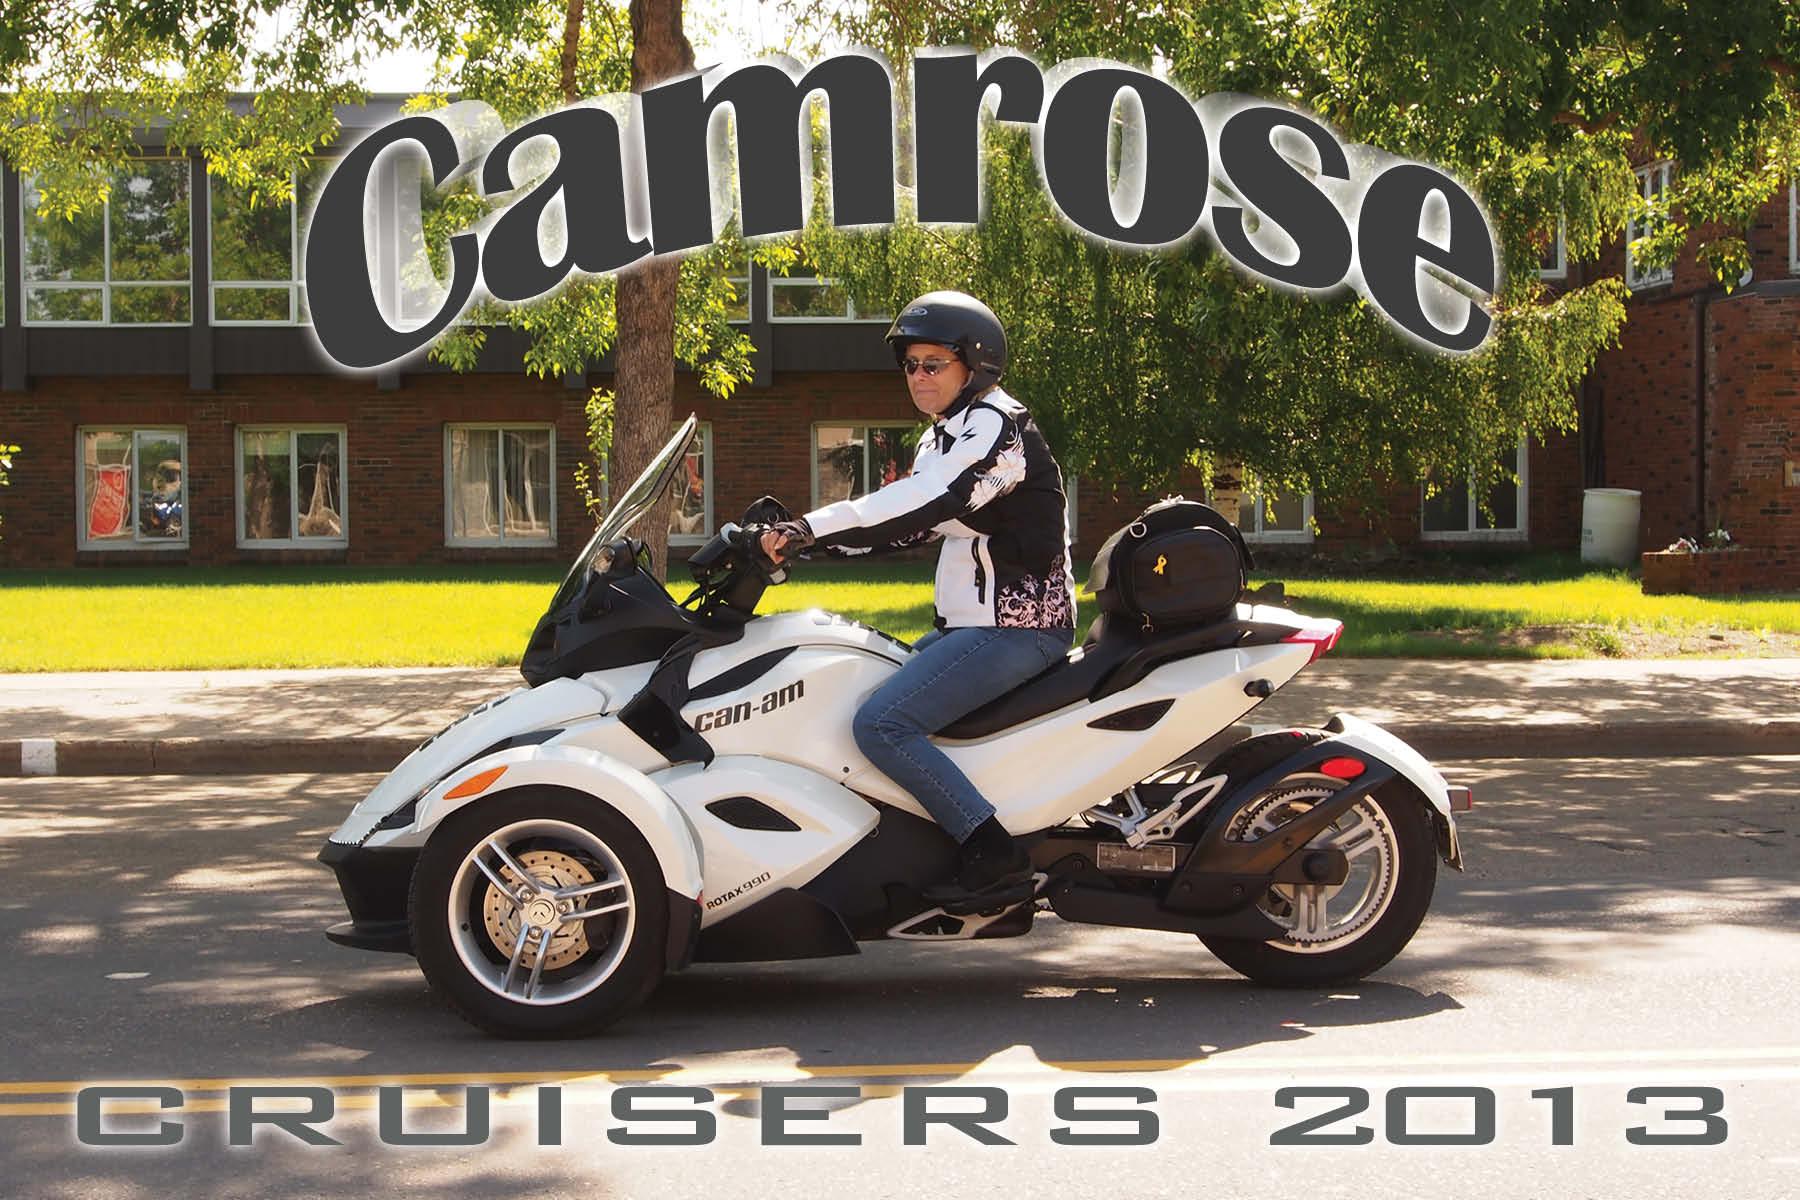 20110528_CamCruisers53.jpg